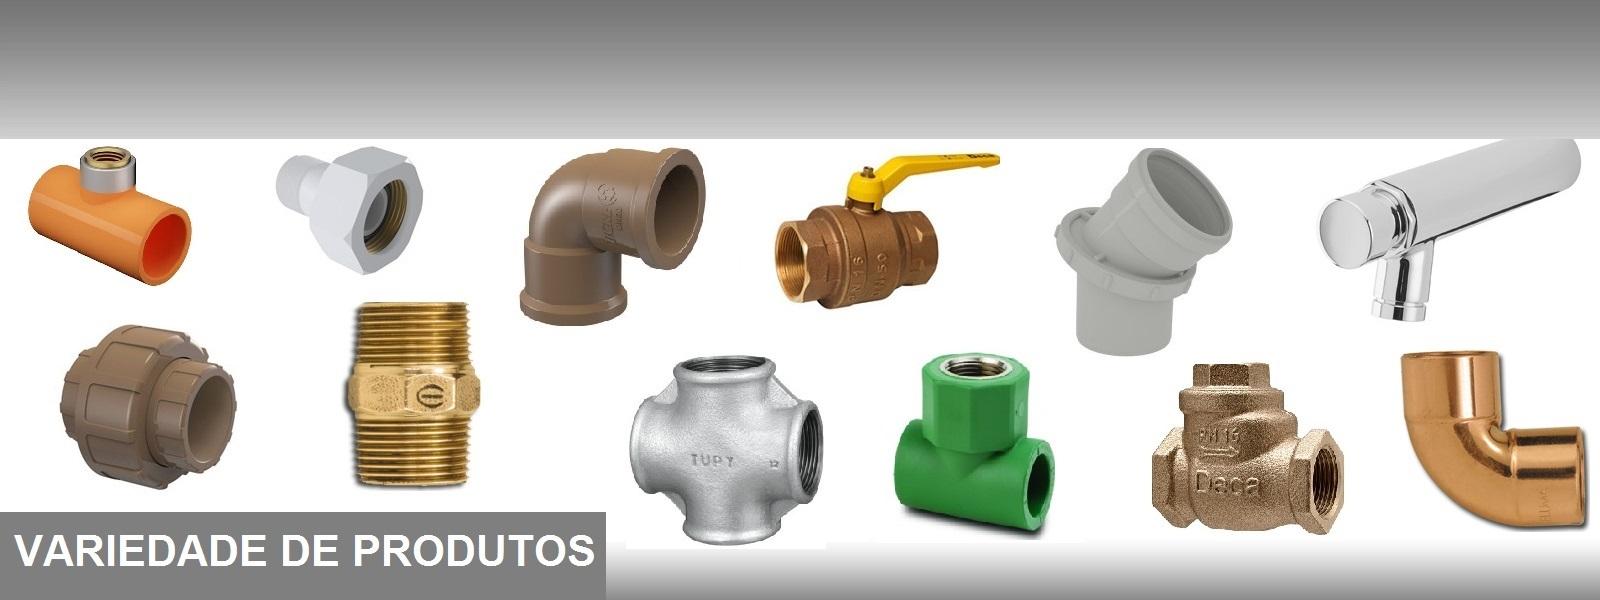 produtos-hidraulicos